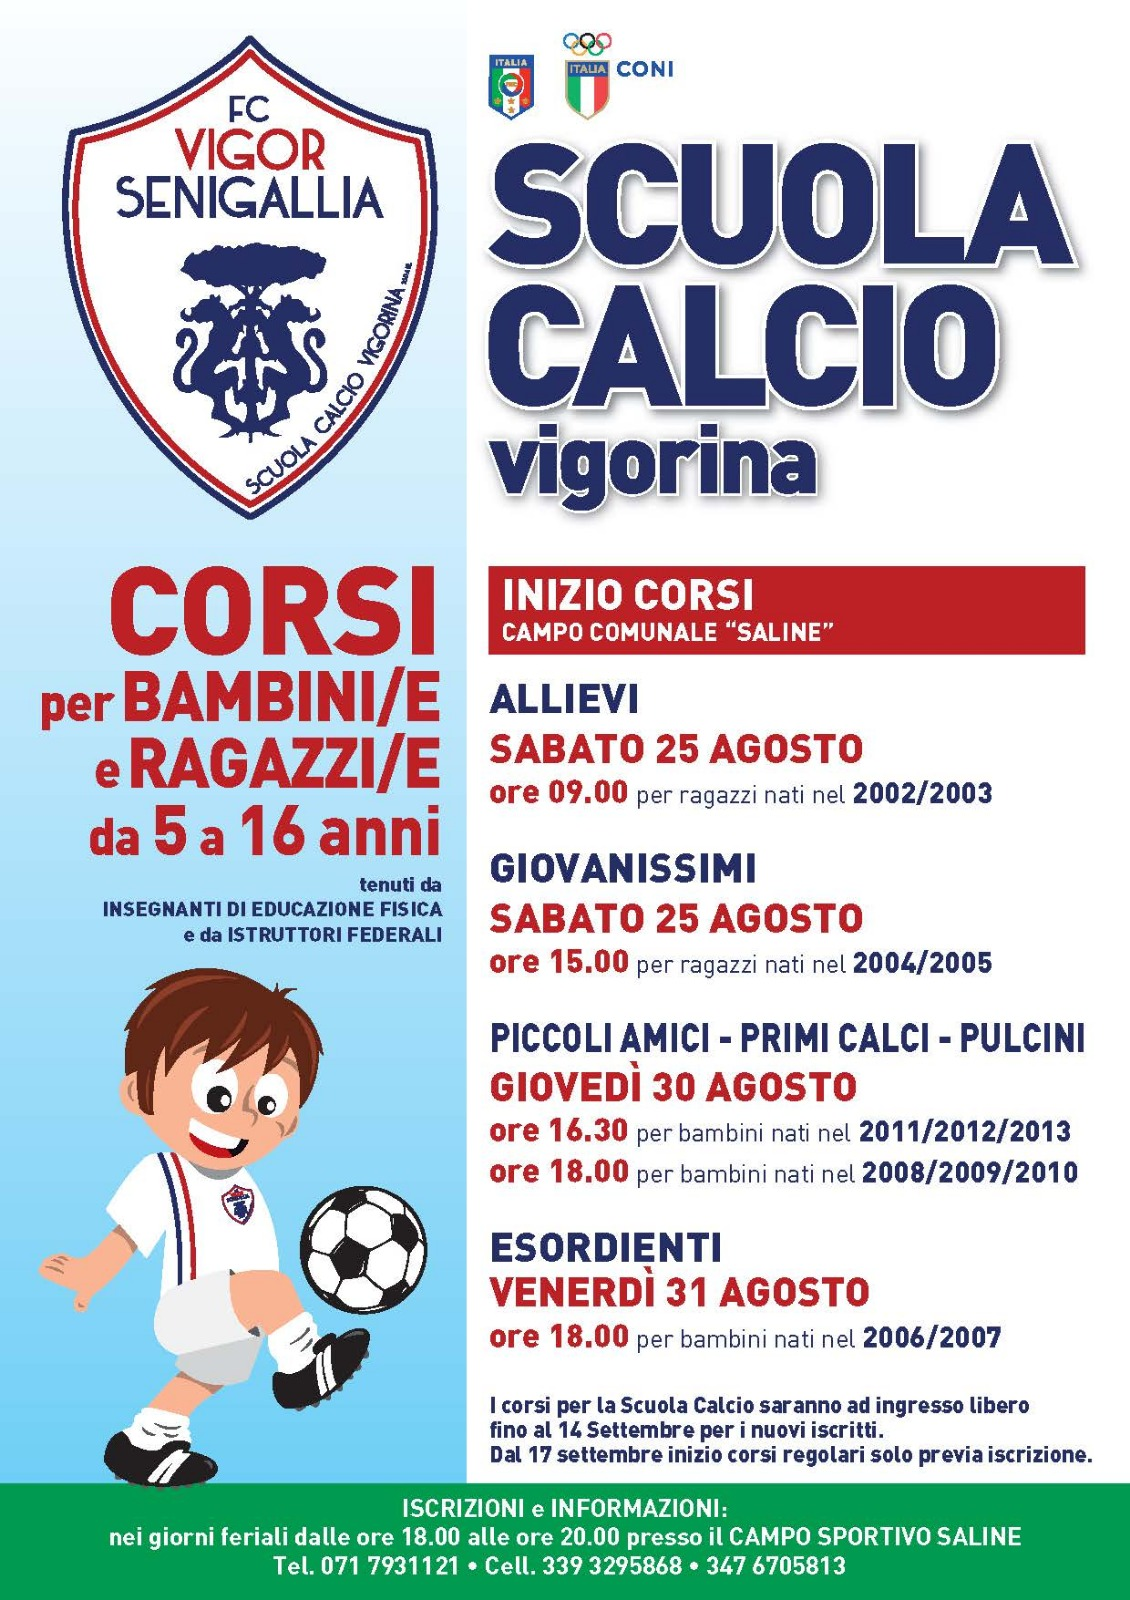 Locandina FC Vigor Senigallia - Scuola Calcio Vigorina